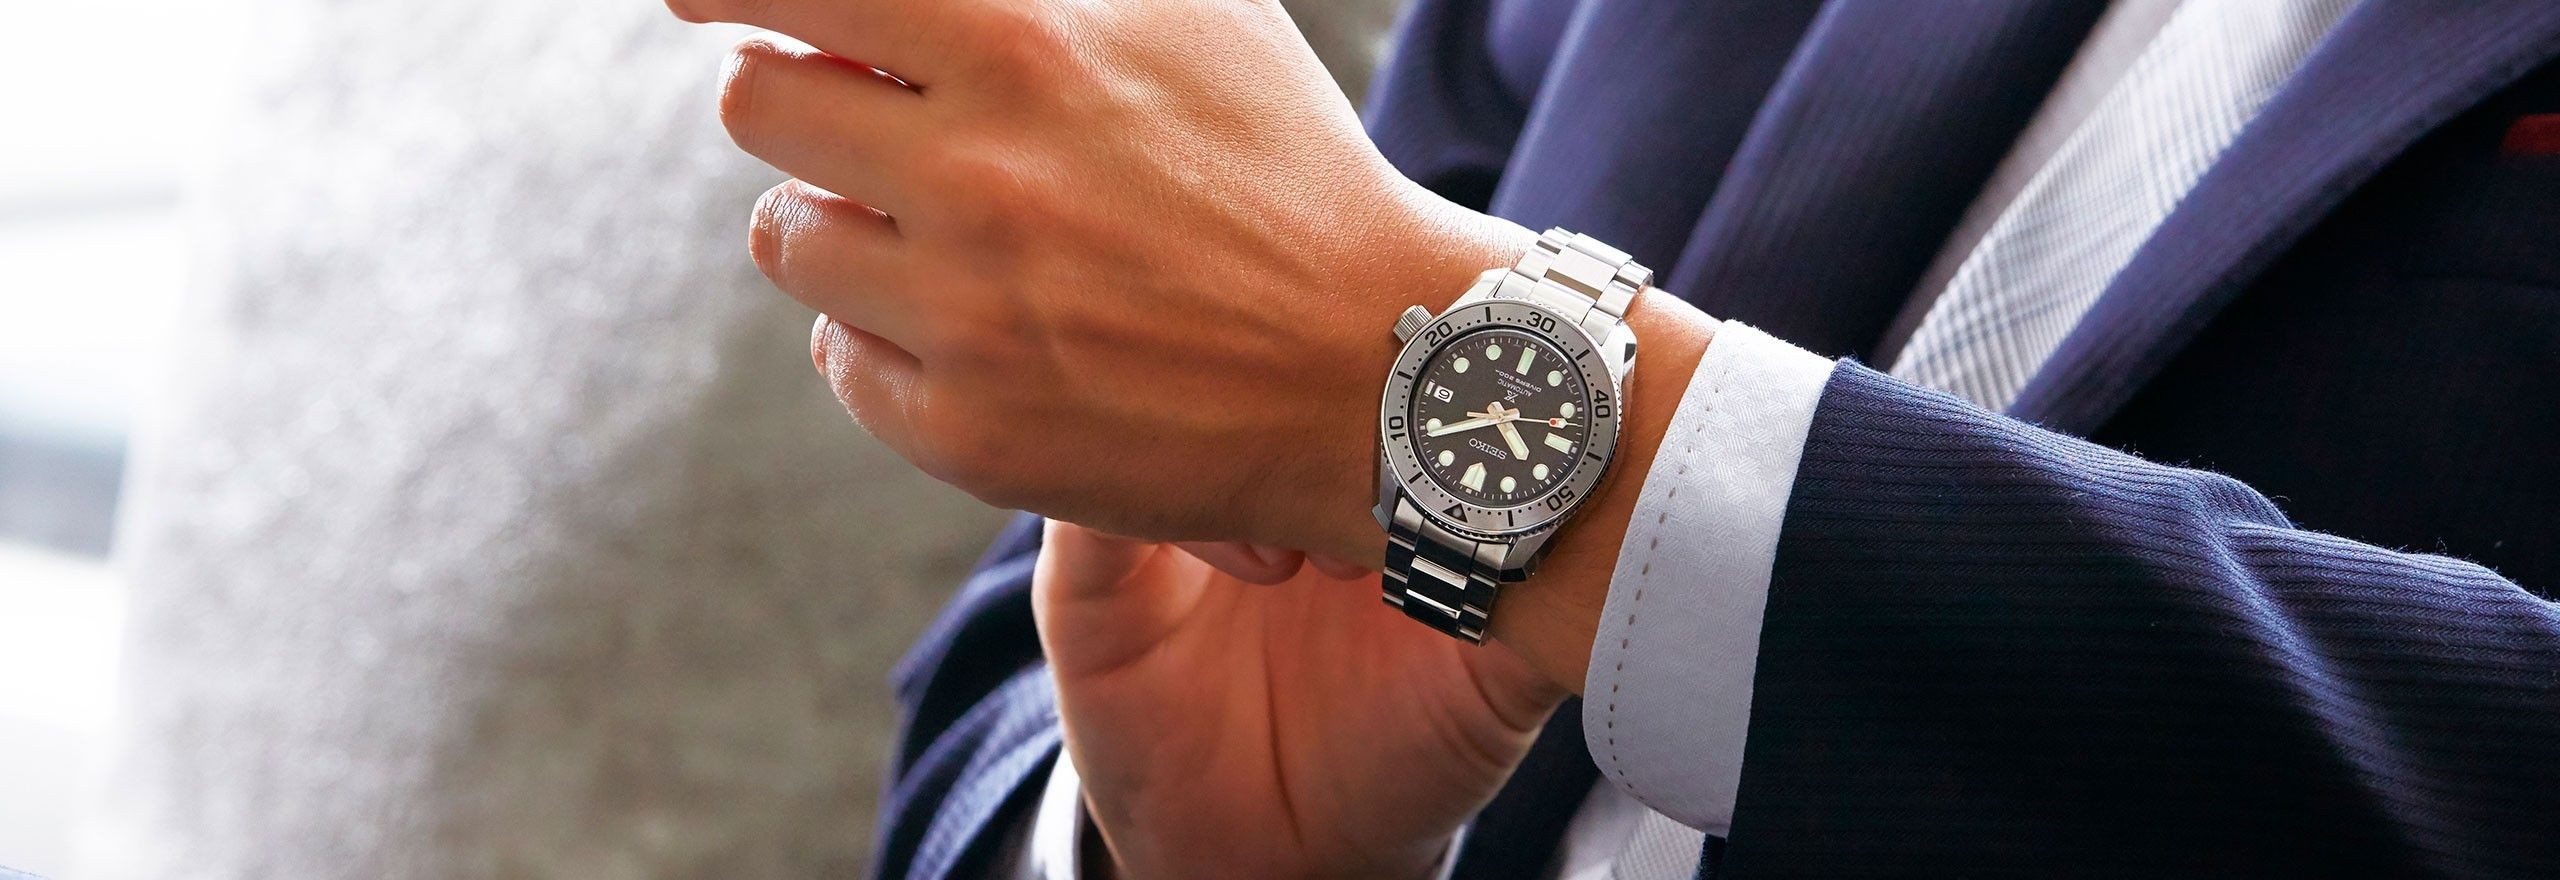 Relojes Hombre Seiko. Seiko Boutique Tienda Online Oficial